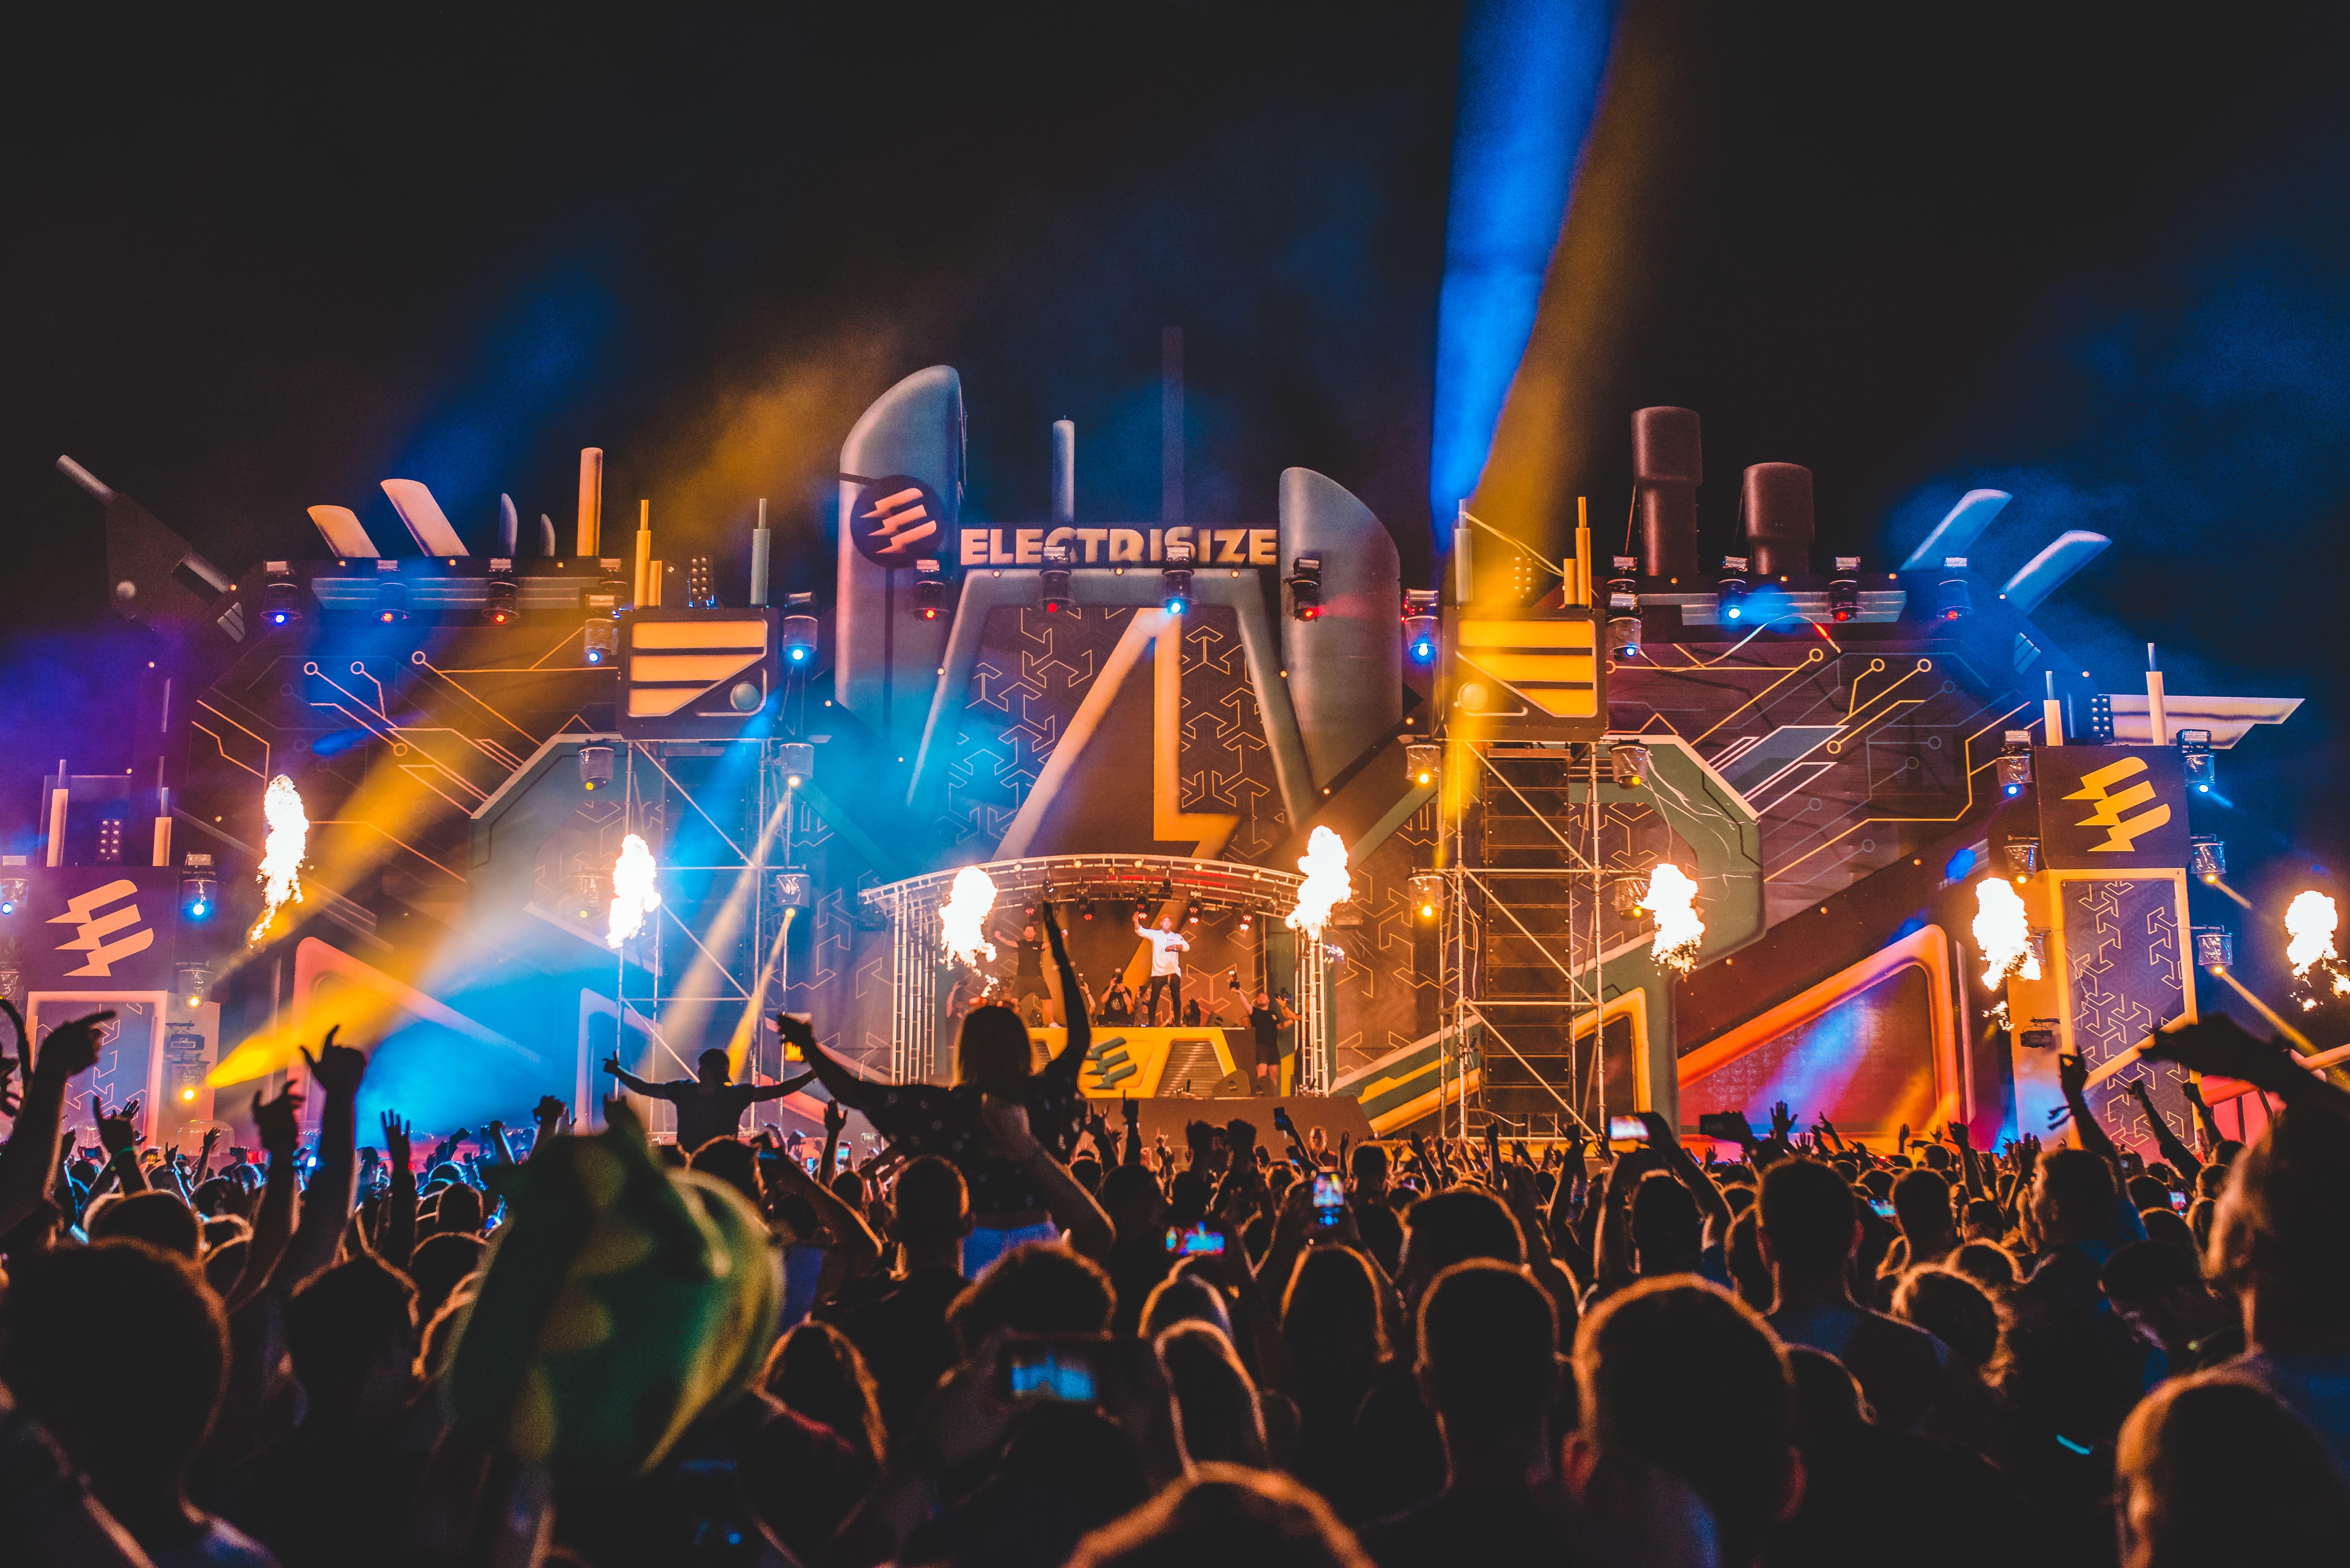 Electrisize Festival 2018